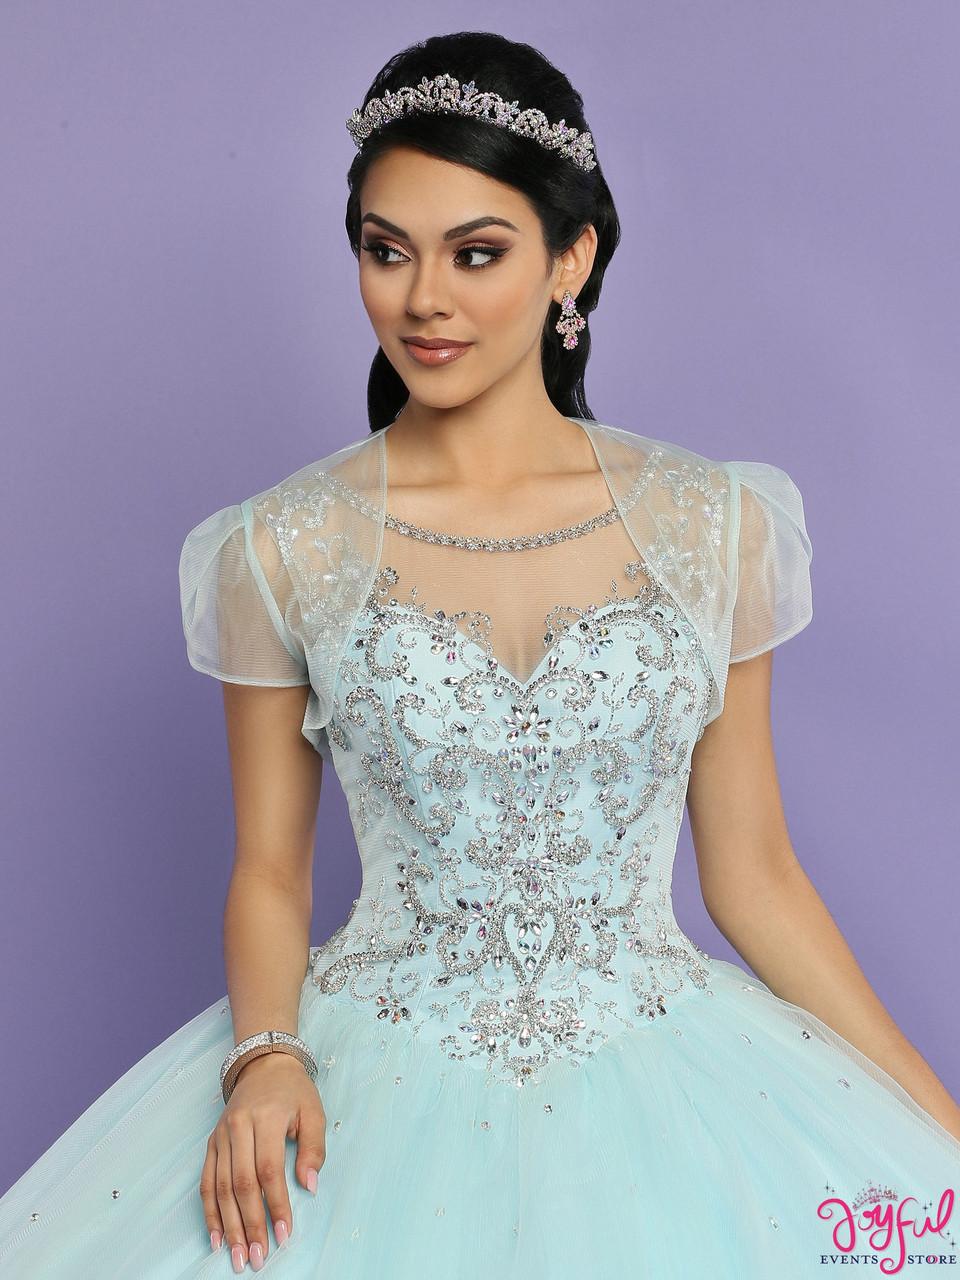 c904686667a Quinceanera Dress  80385 · Quinceanera Dress  80385 ...